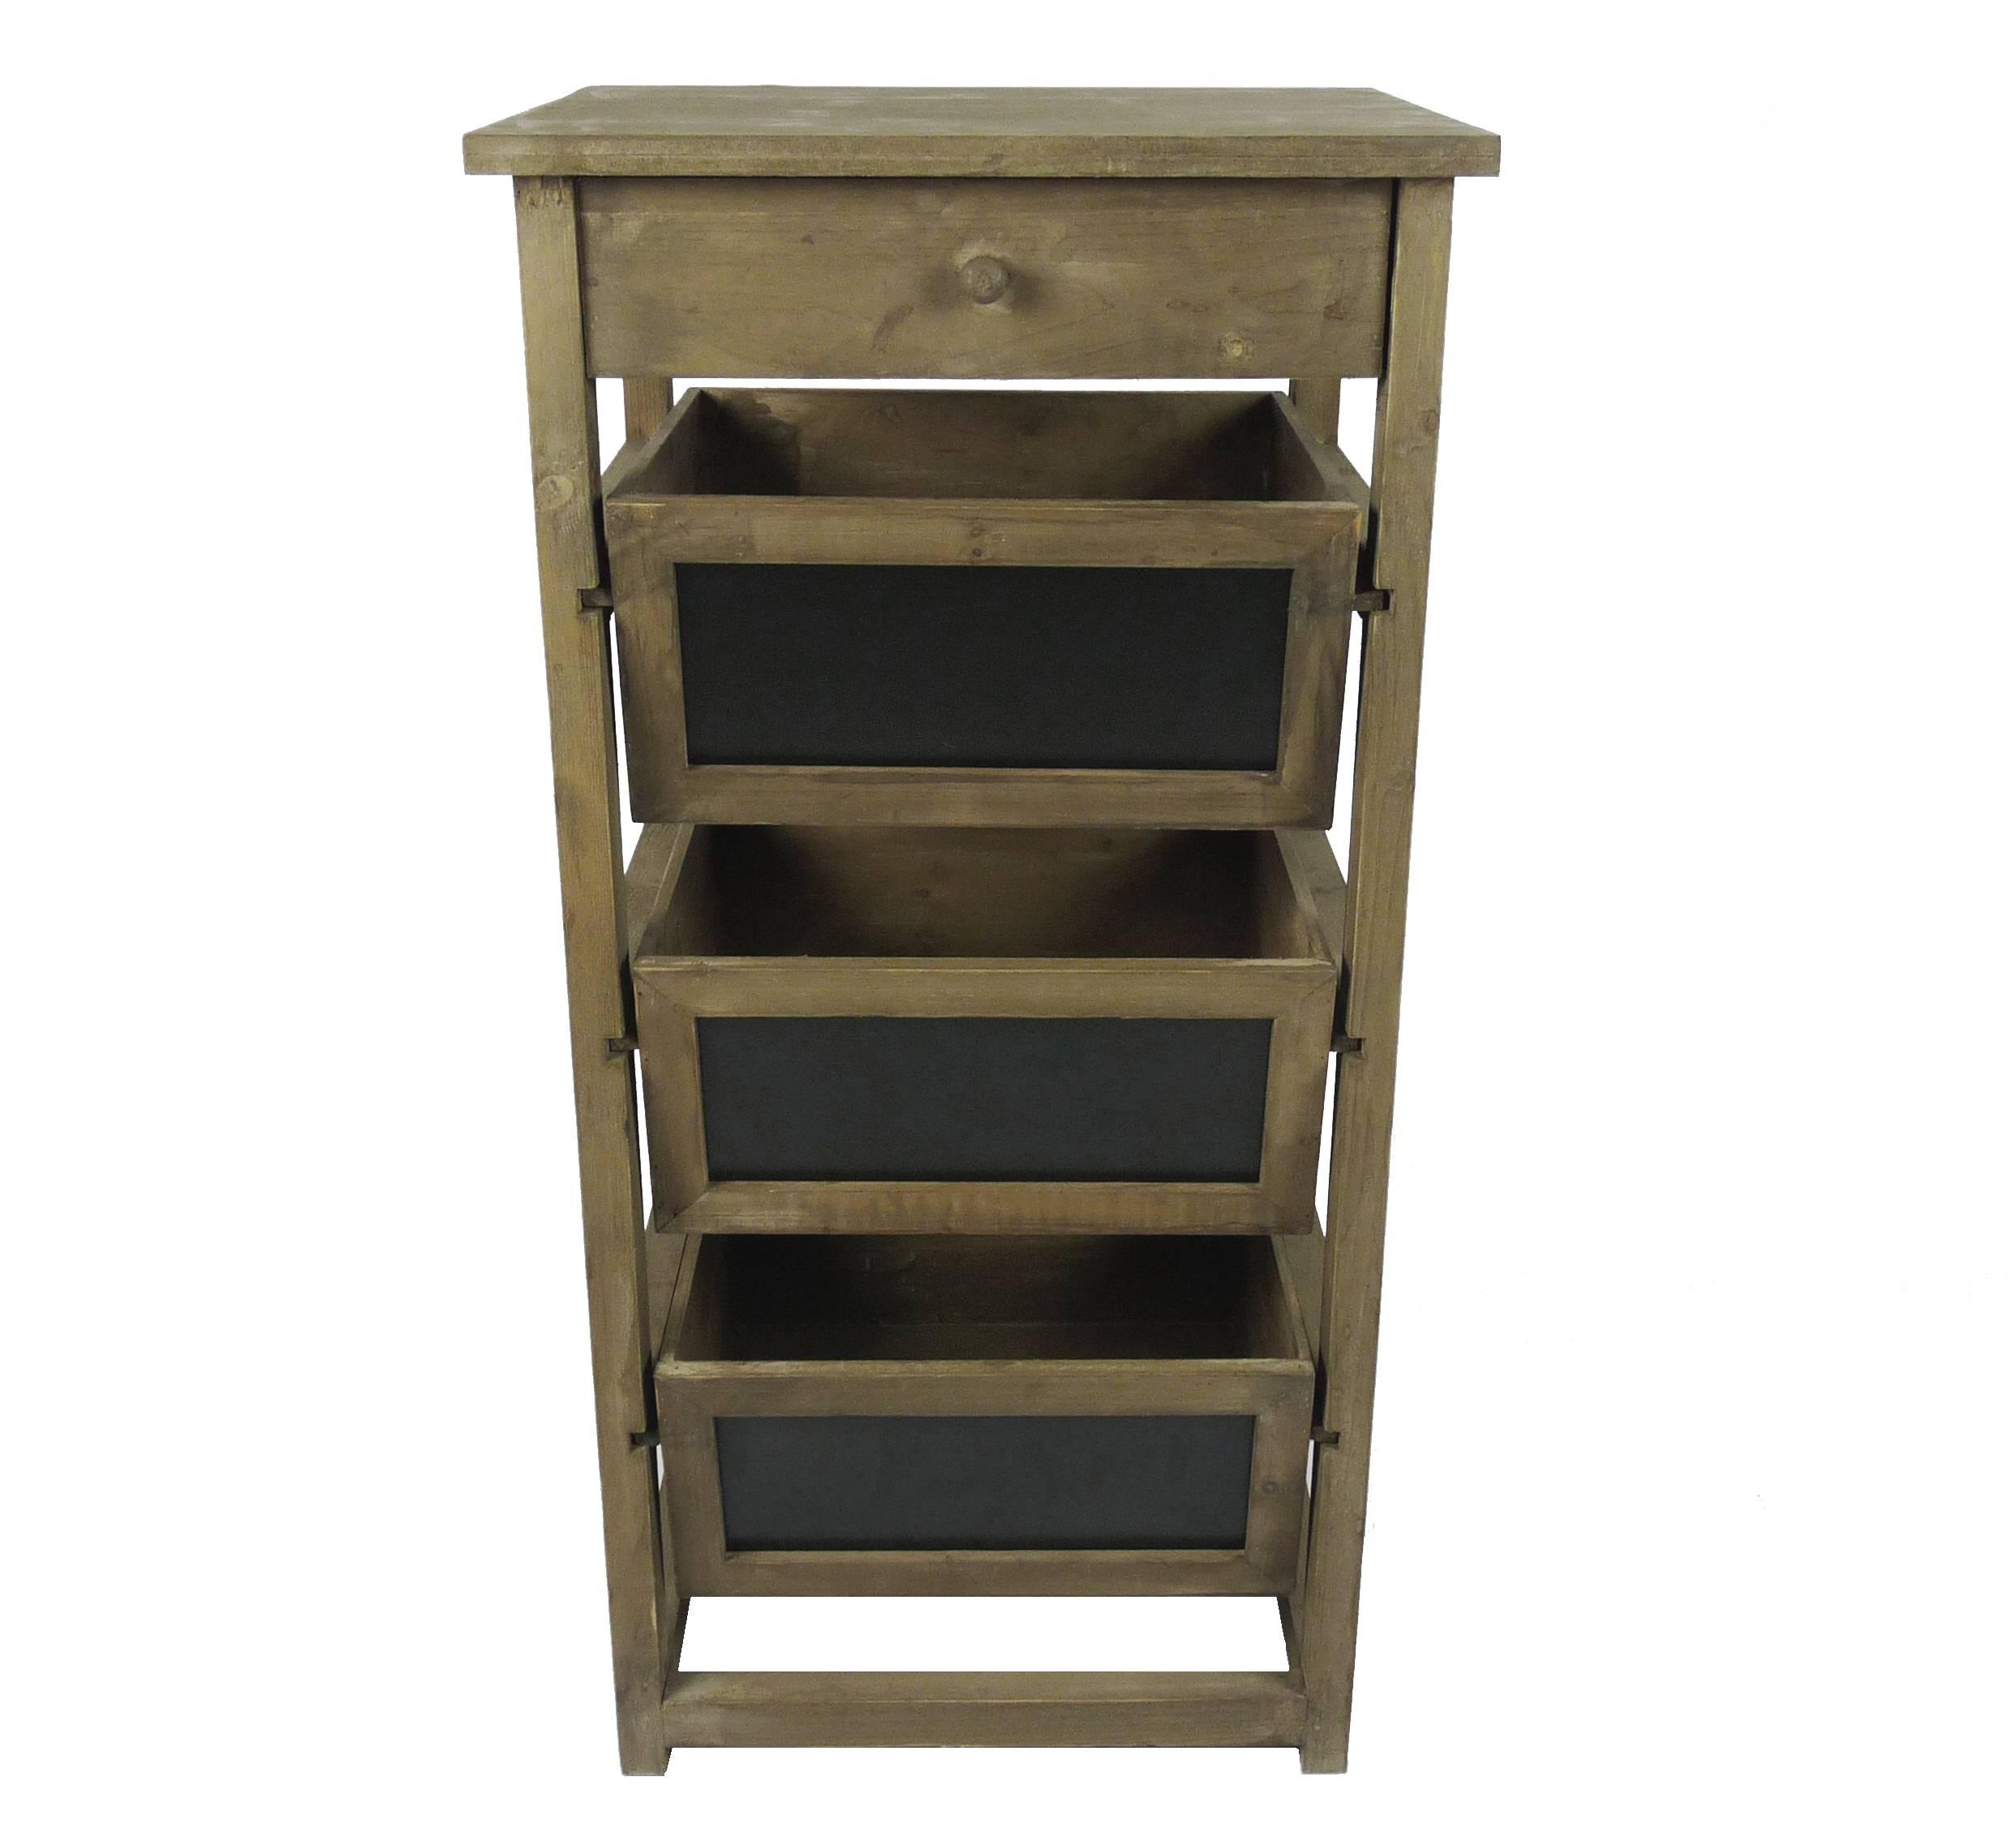 Leroy Merlin Salle De Bain Vasque A Poser ~ semainier colonne 1 tiroir 3 casier ardoise en bois console d